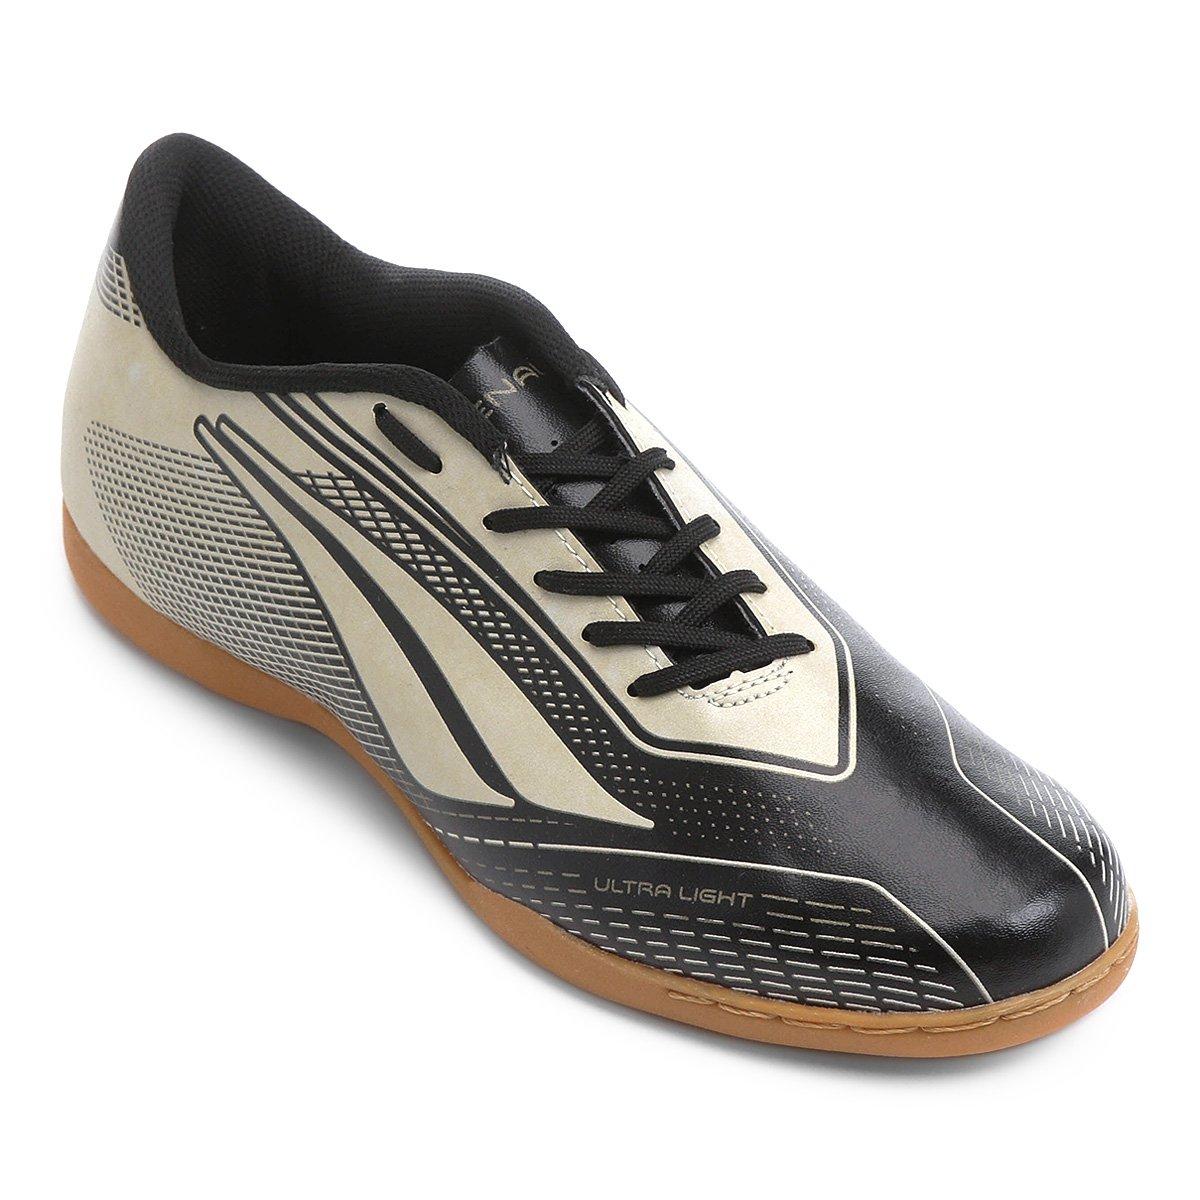 Chuteira Penalty Futsal e Preto Masculina Dourado 7 Speed Storm rprd5q